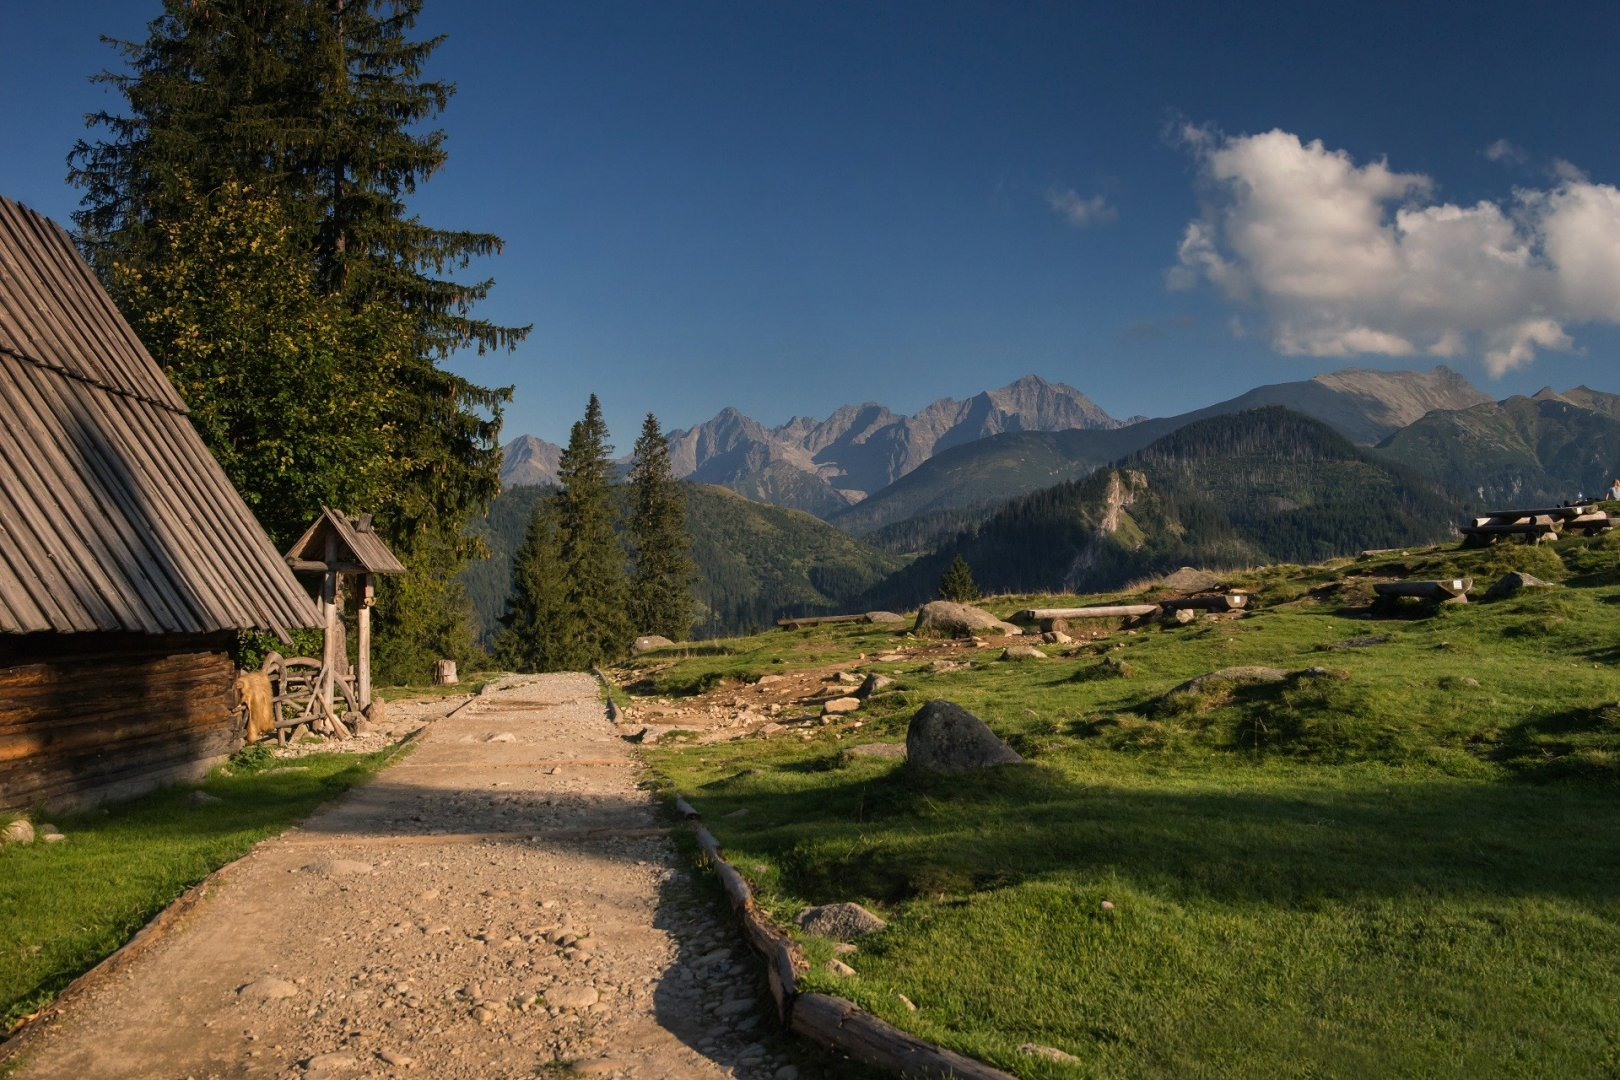 Trekking Holidays - Tatras for Begginers